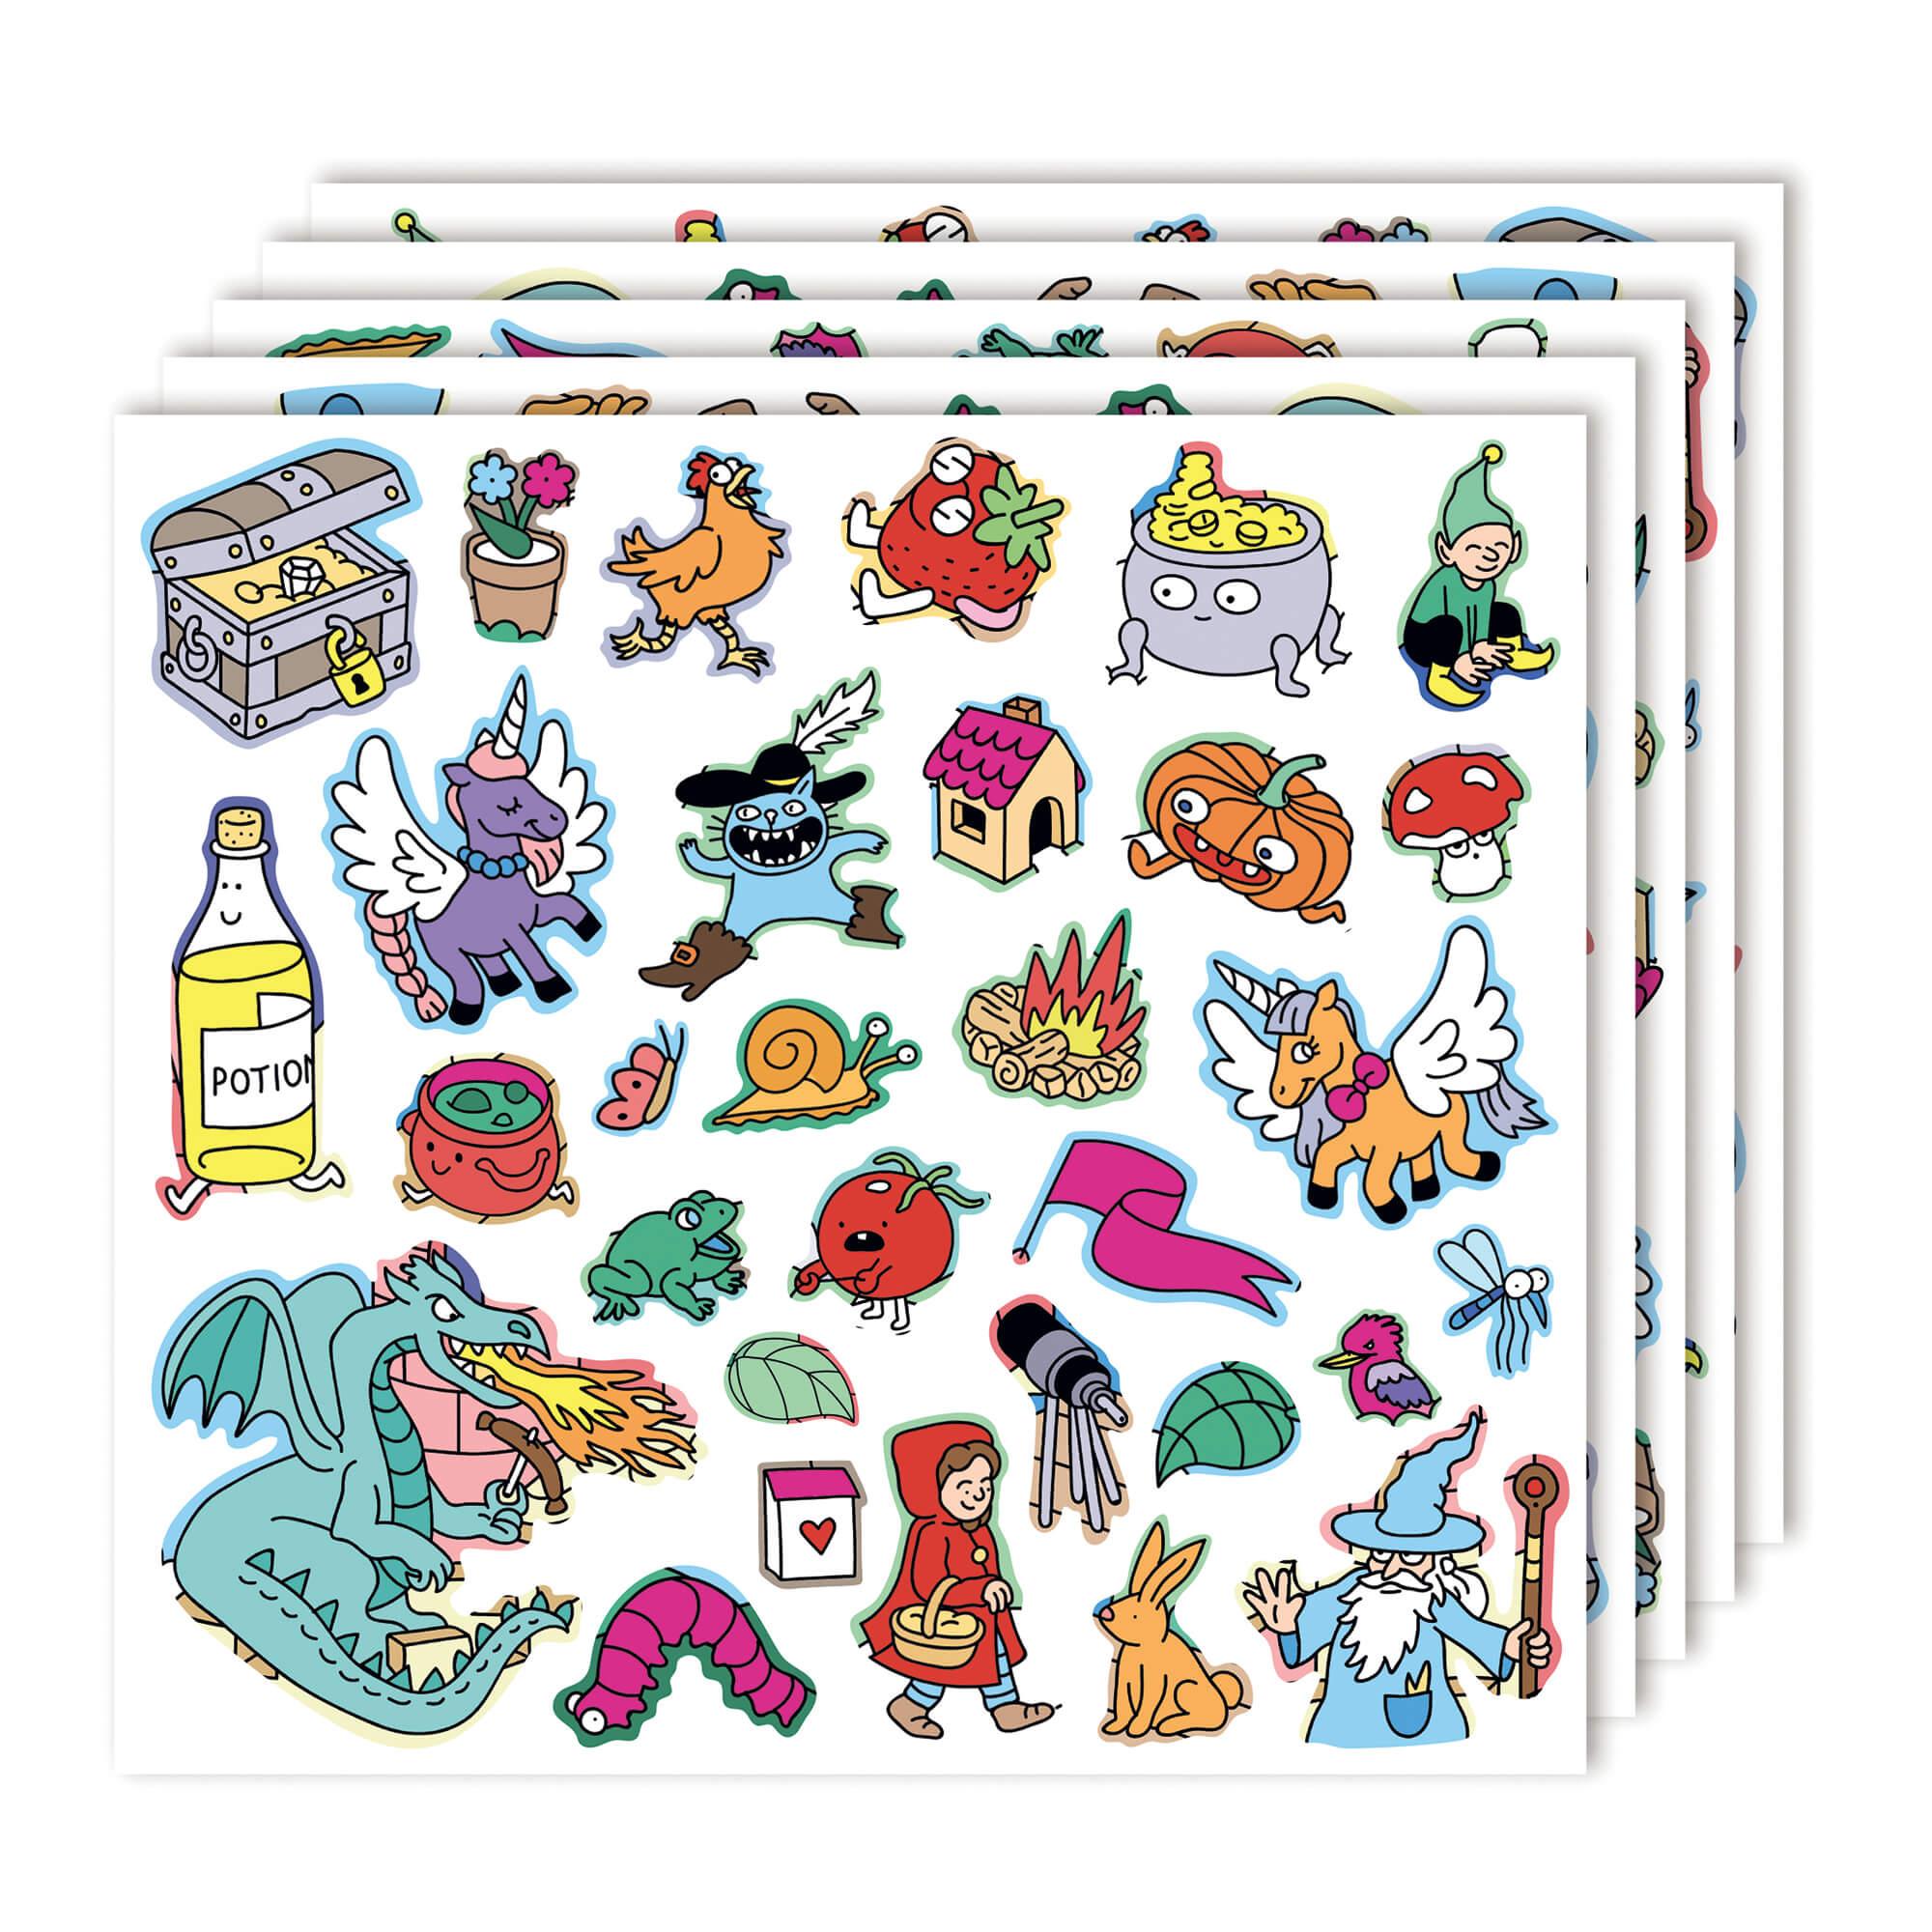 Poster à colorier géant + Stickers FANTASTIC by OMY